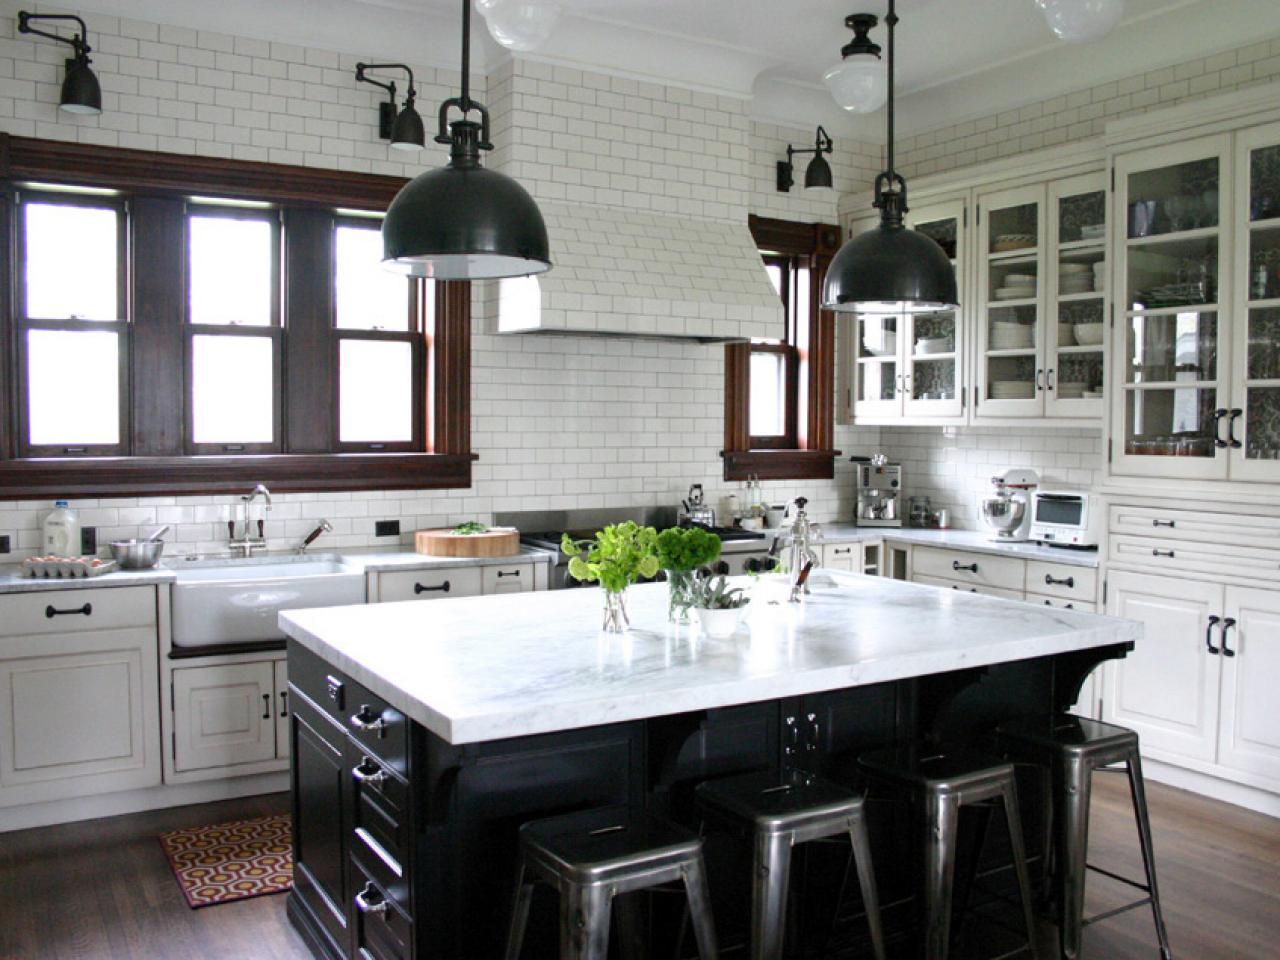 DP_Zaveloff-white-kitchen-cabinets_s4x3.jpg.rend.hgtvcom.1280.960.jpeg